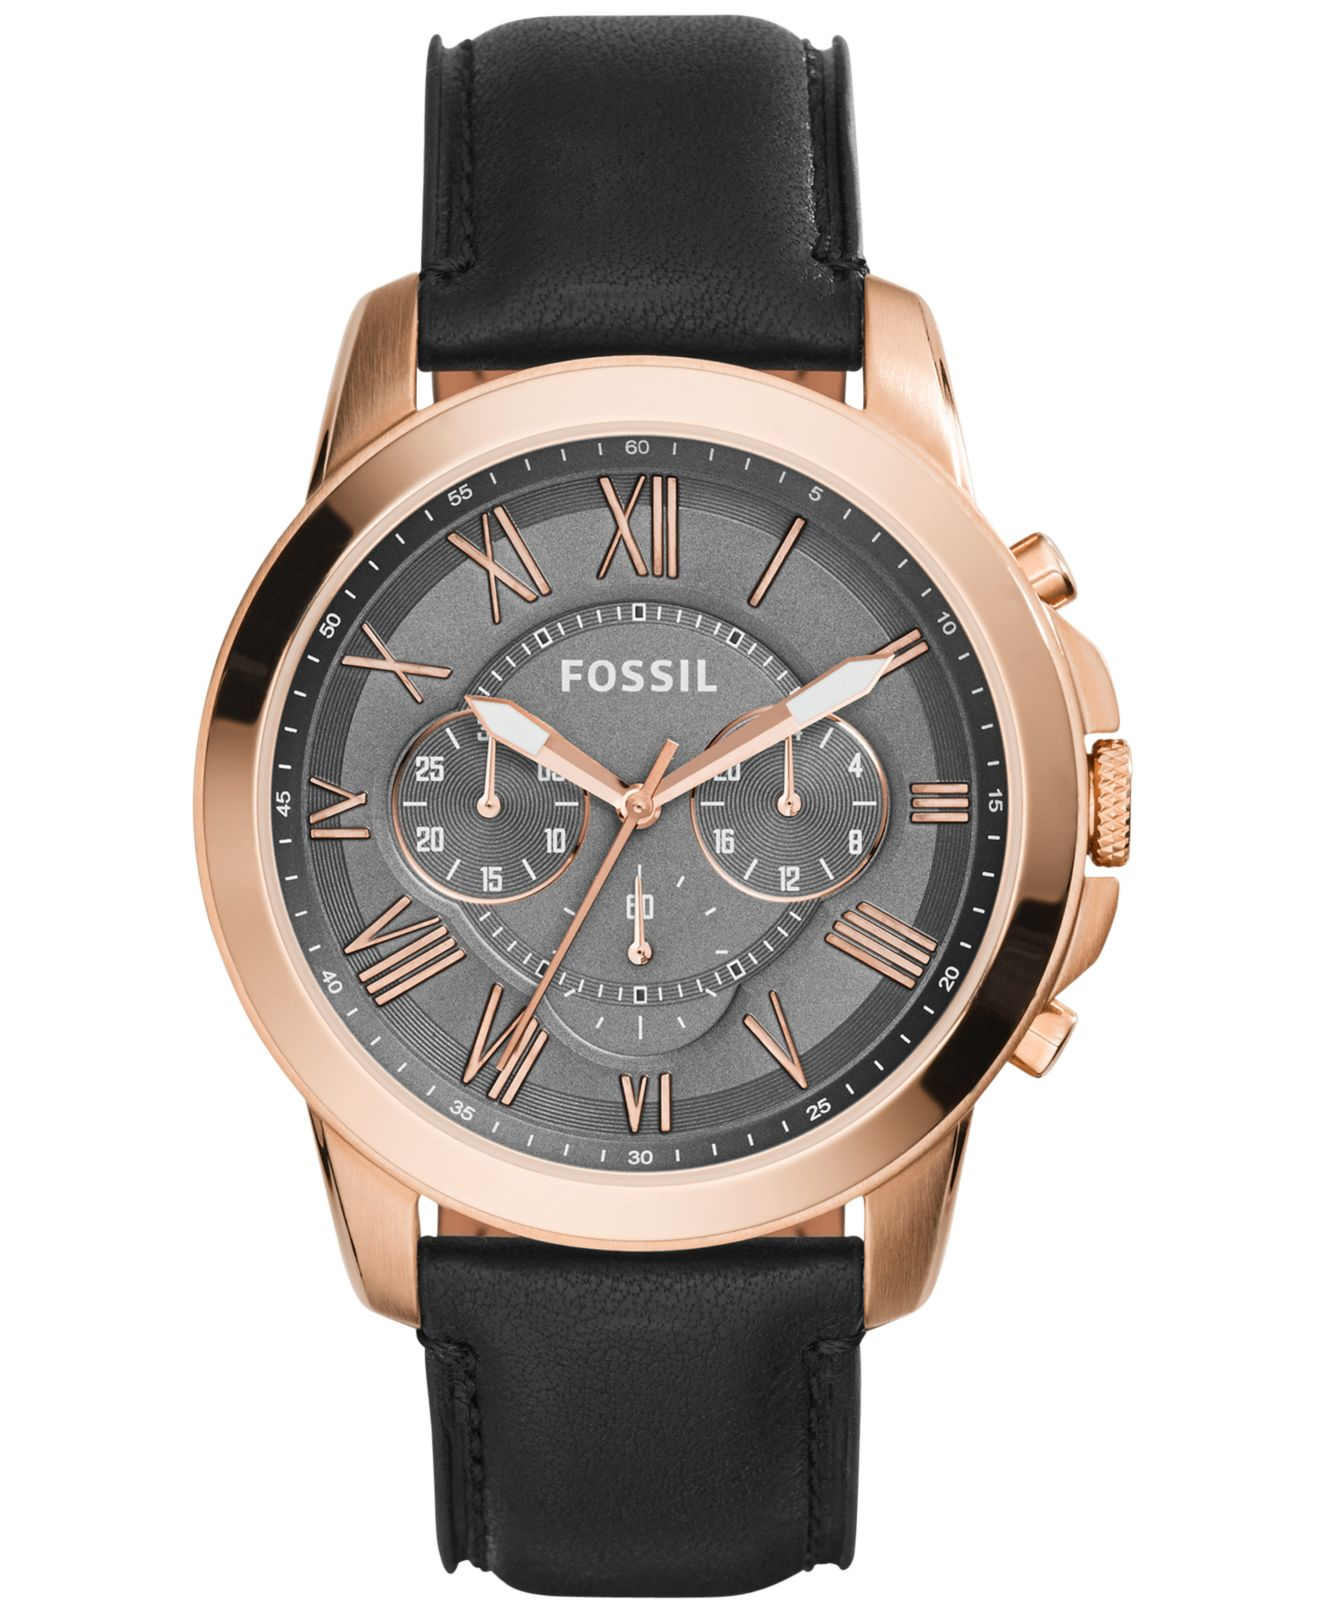 Fossil men 39 s chronograph grant black leather strap watch 45mm fs5085 in black for men lyst for Black leather strap men